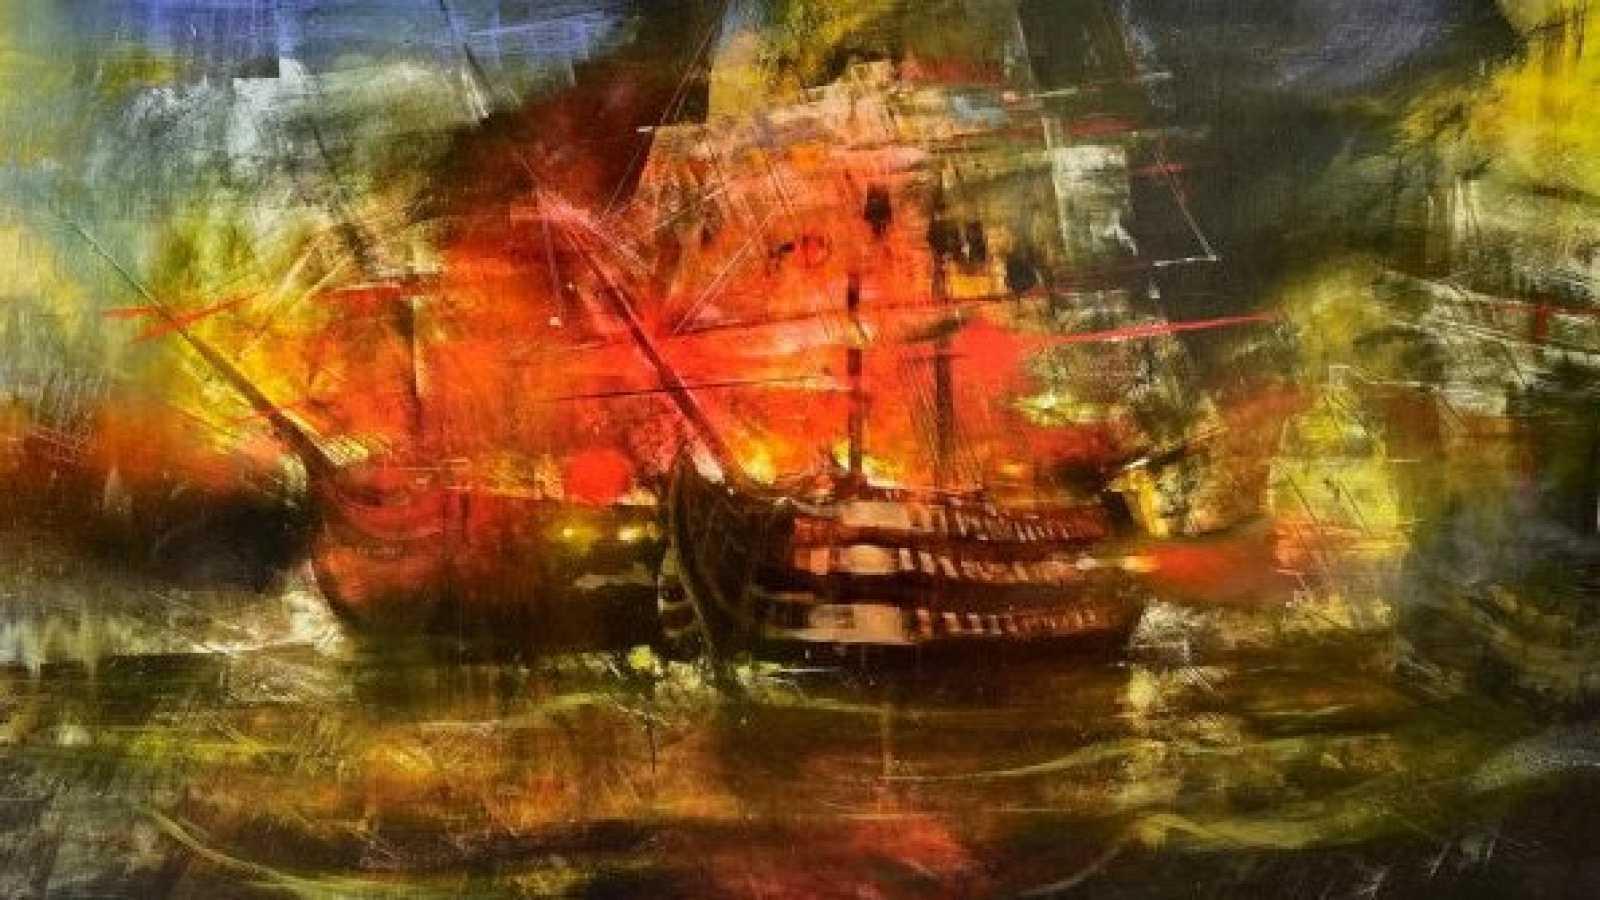 Un joven pintor malagueño recrea la batalla de Trafalgar en 40 cuadros